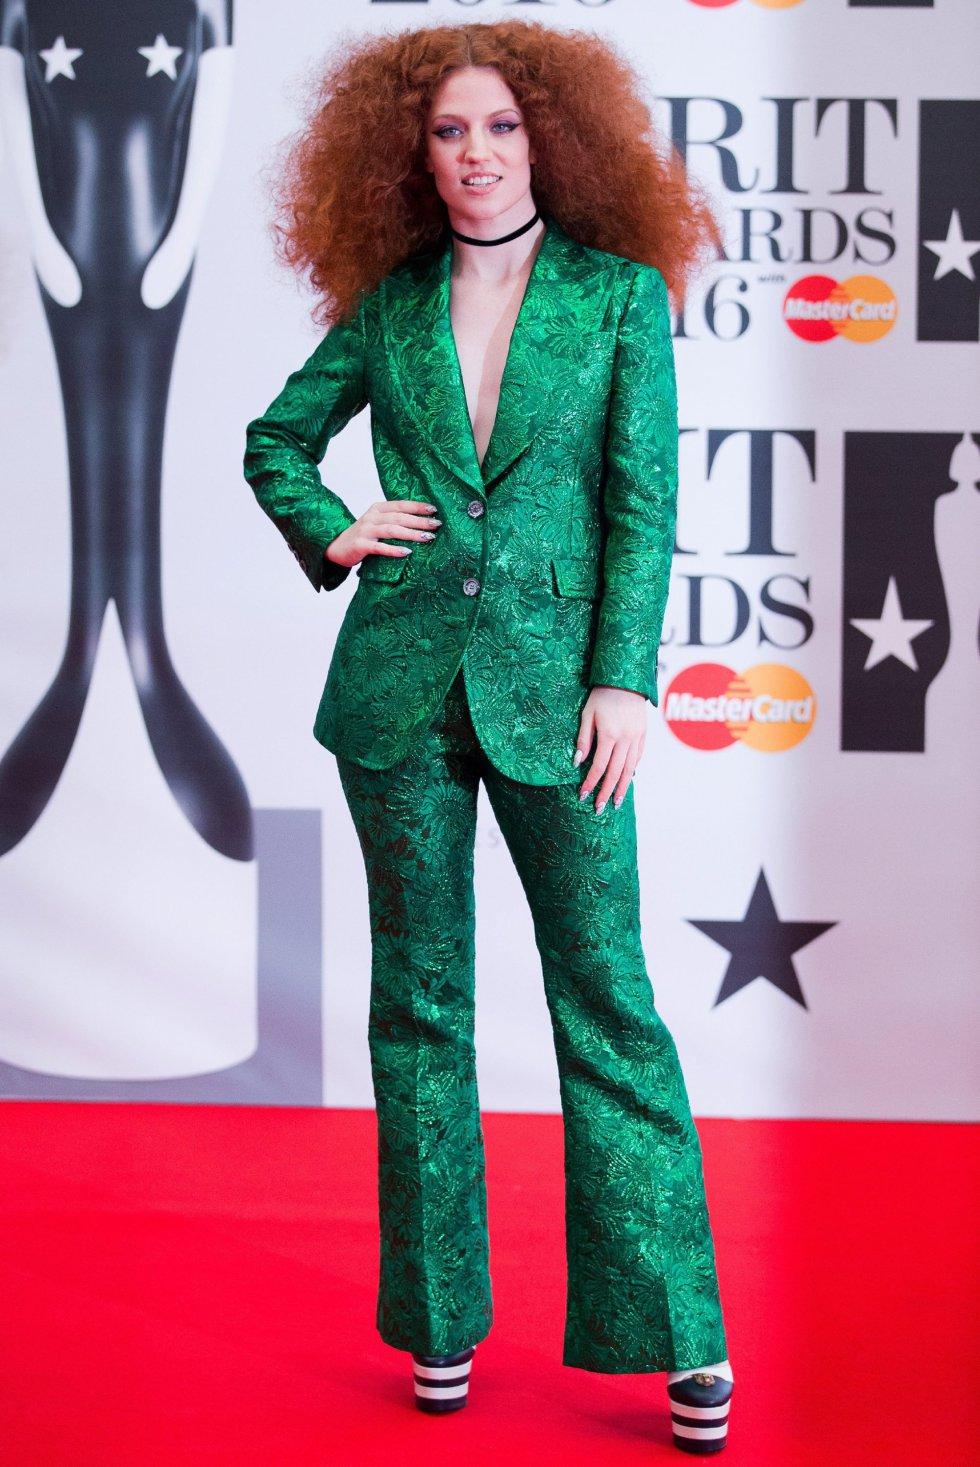 La cantante británica Jess Glynne, de verde.